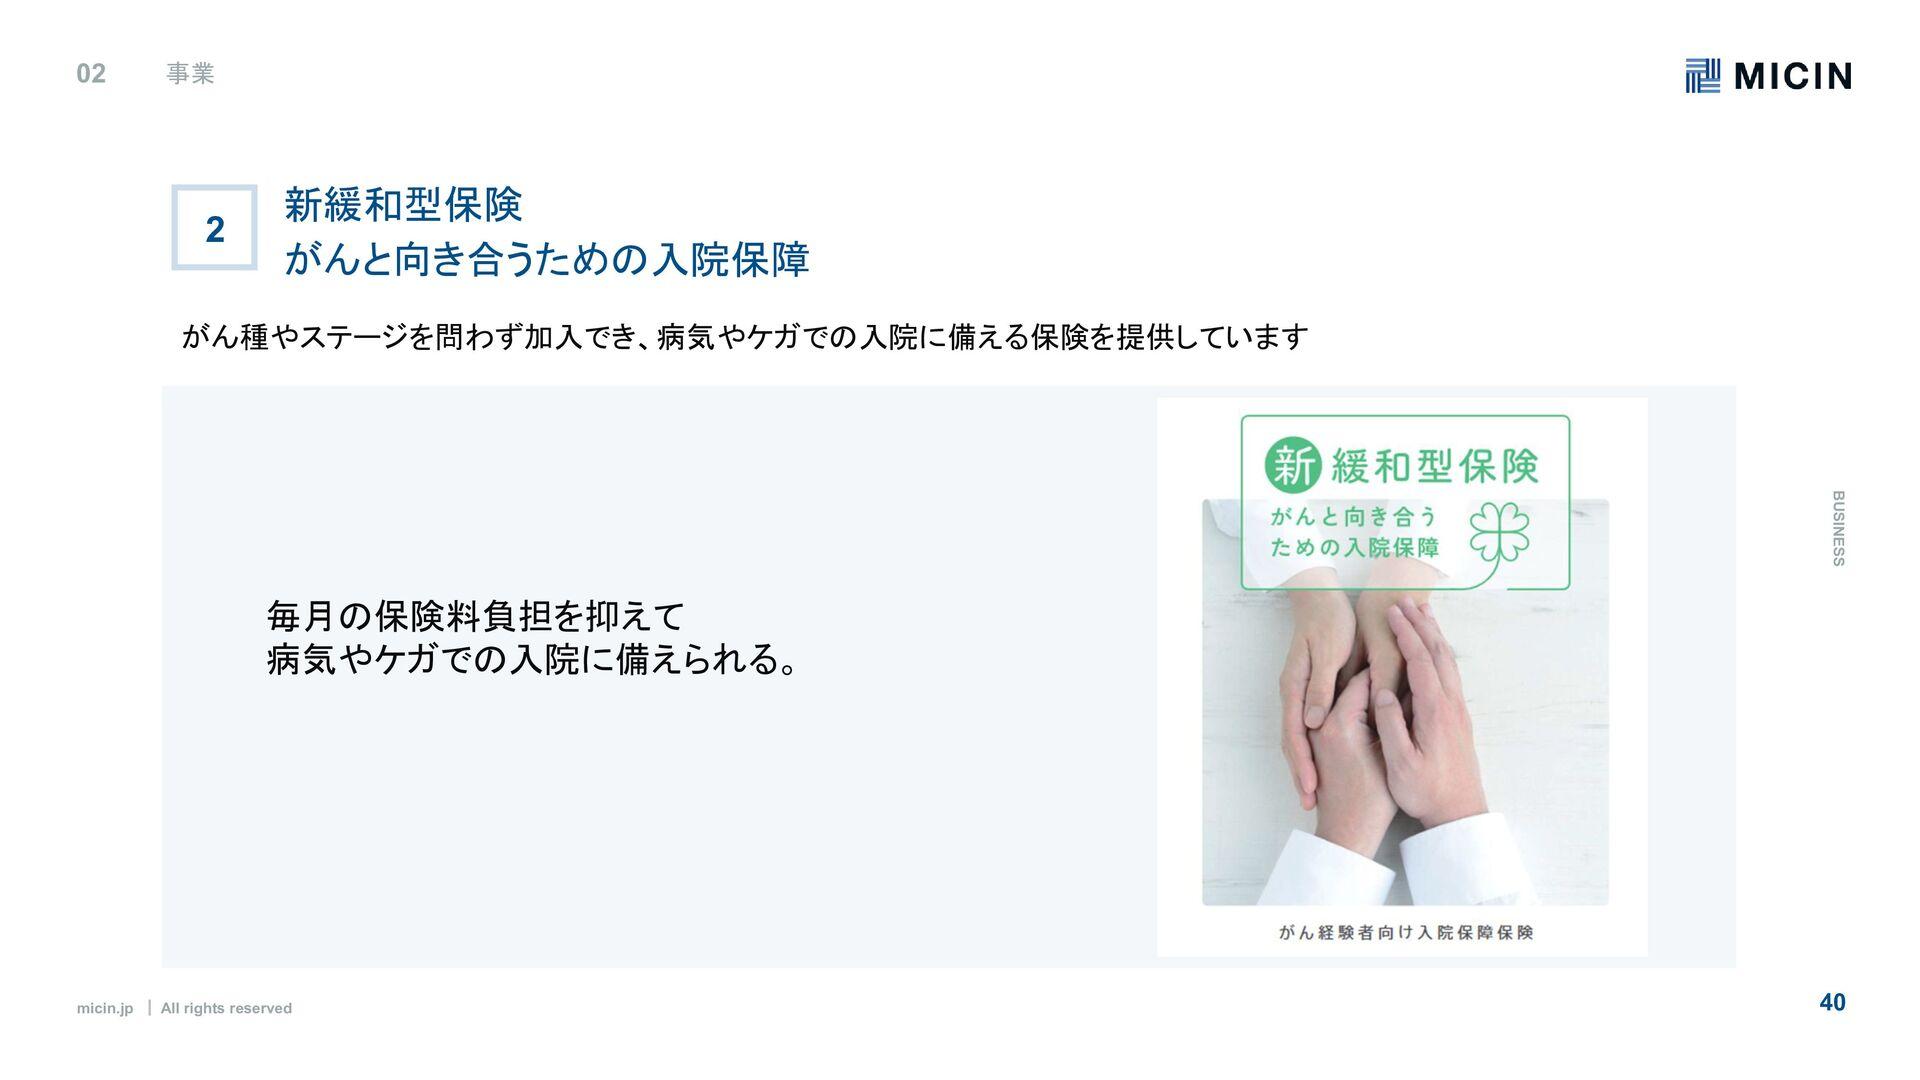 micin.jp   All rights reserved 出社(オンライン医療事業部 M....